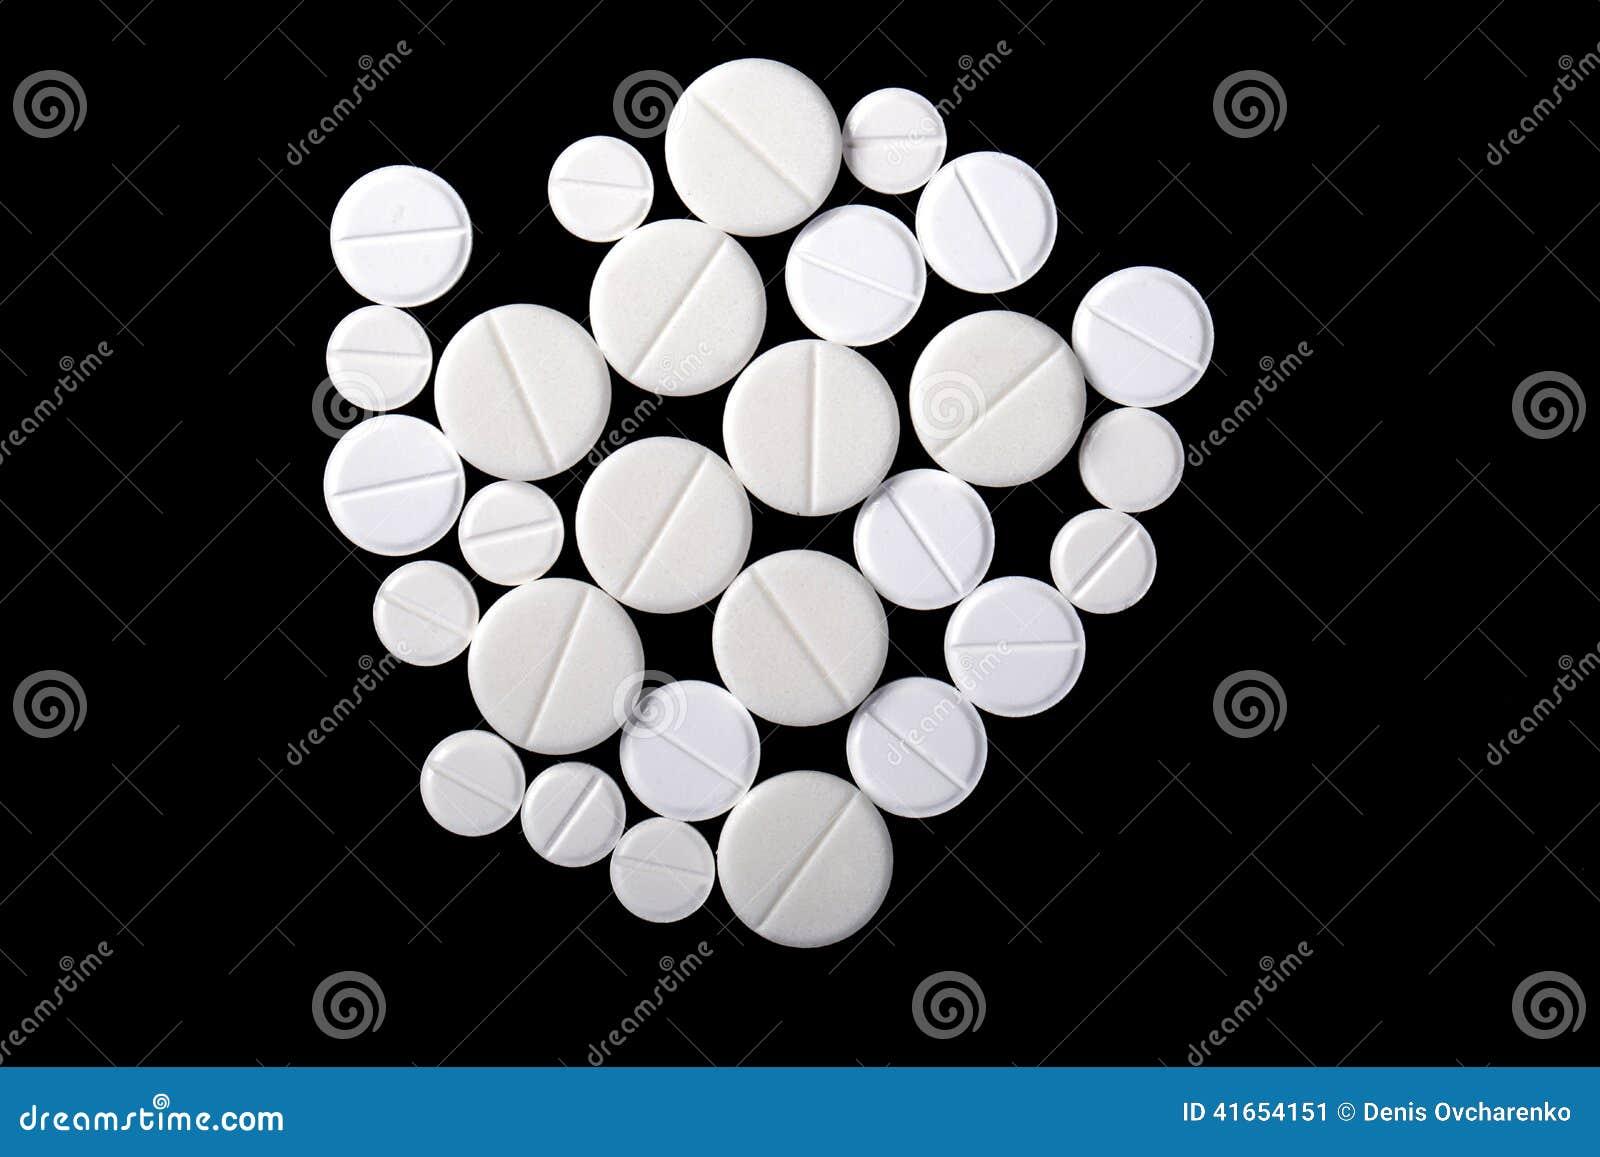 пилюльки микстуры белые